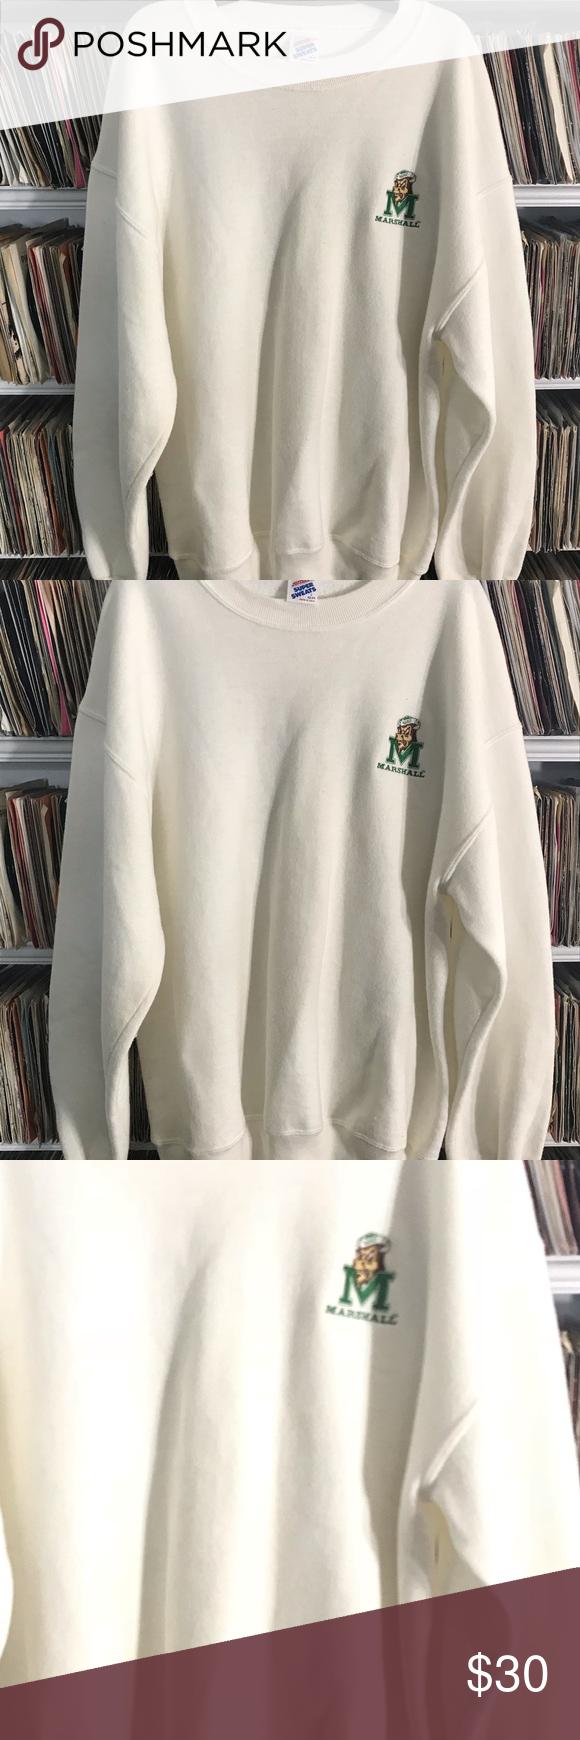 Vintage Marshall University Sweatshirt Sweatshirts Vintage College Sweatshirts University Sweatshirts [ 1740 x 580 Pixel ]